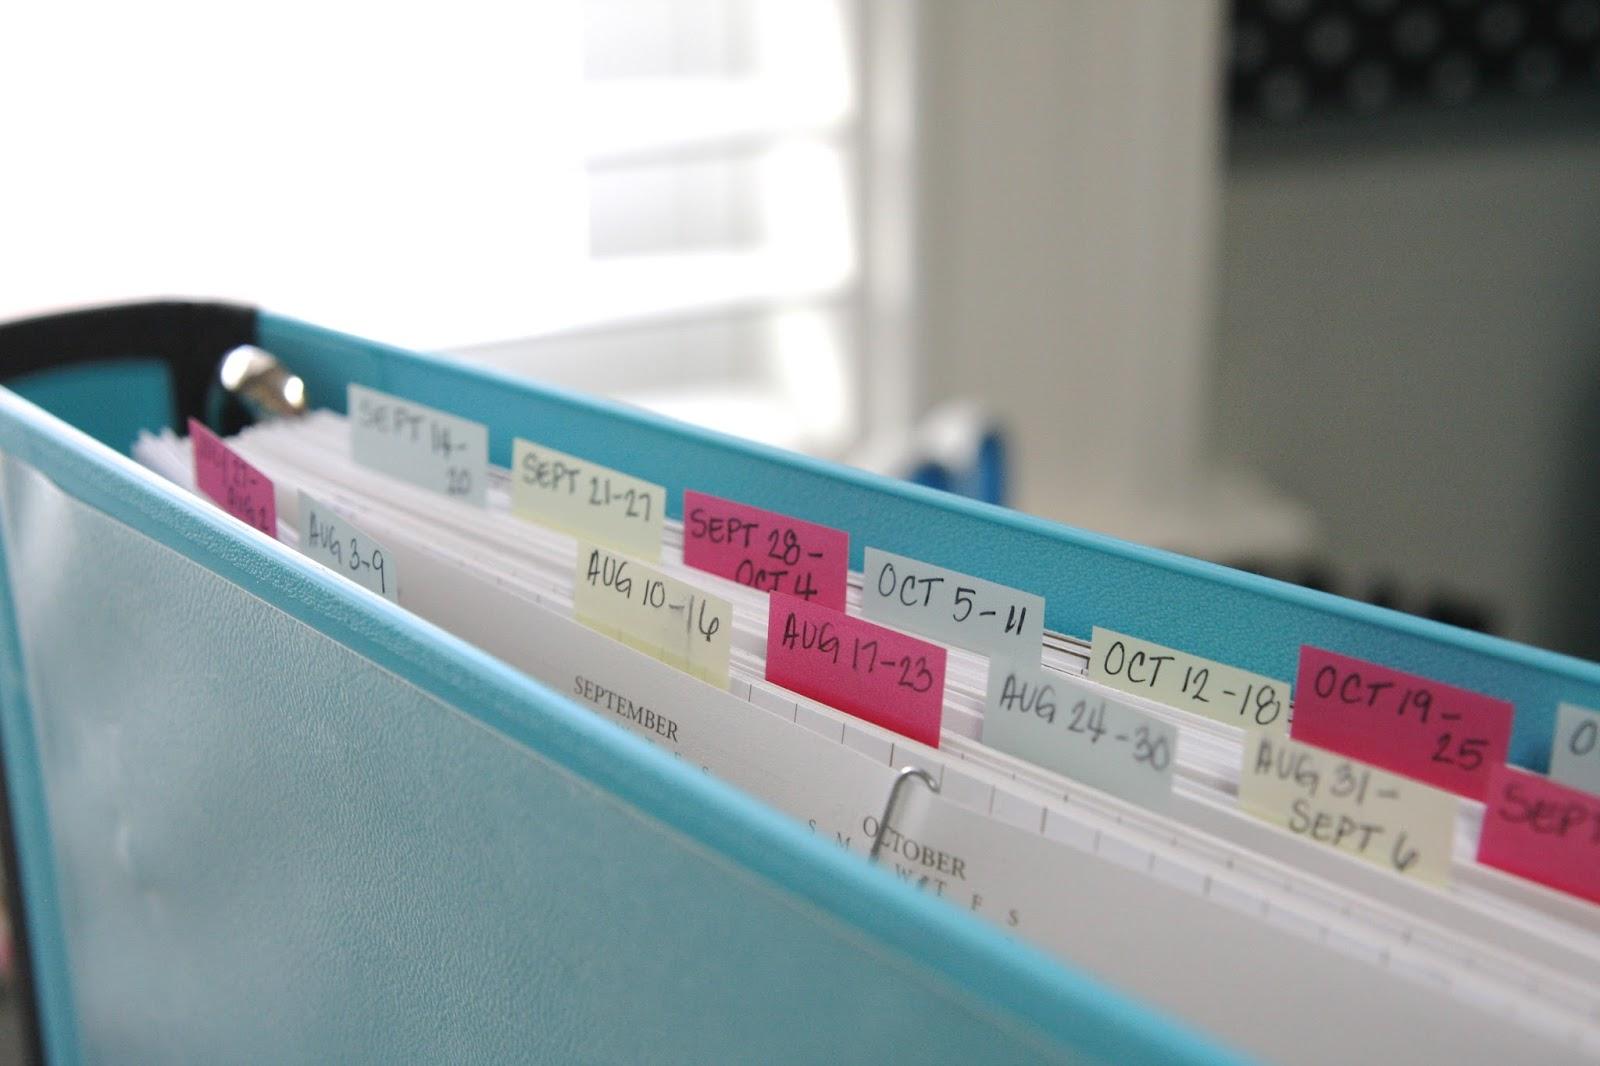 Organized Master Calendar Simply Organized